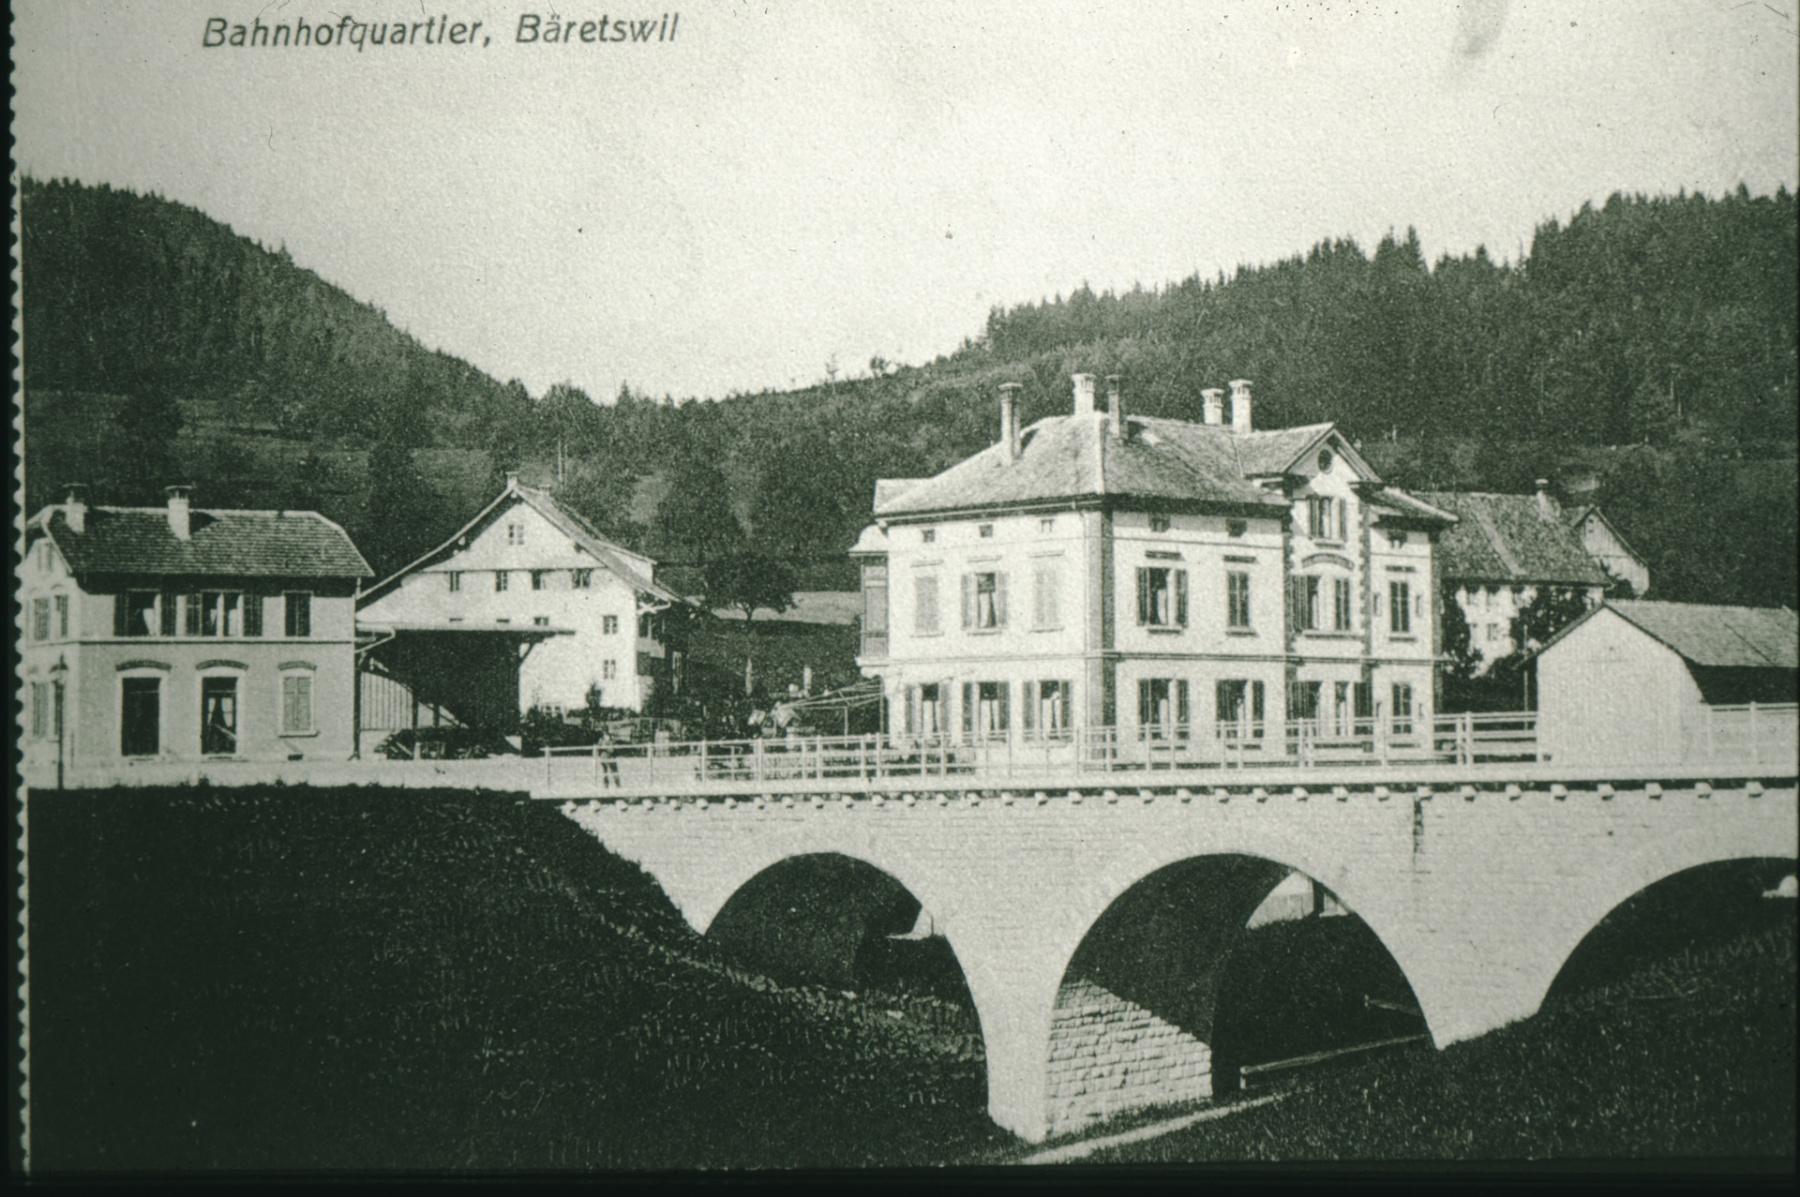 Postkarte. Bahnhofquartier